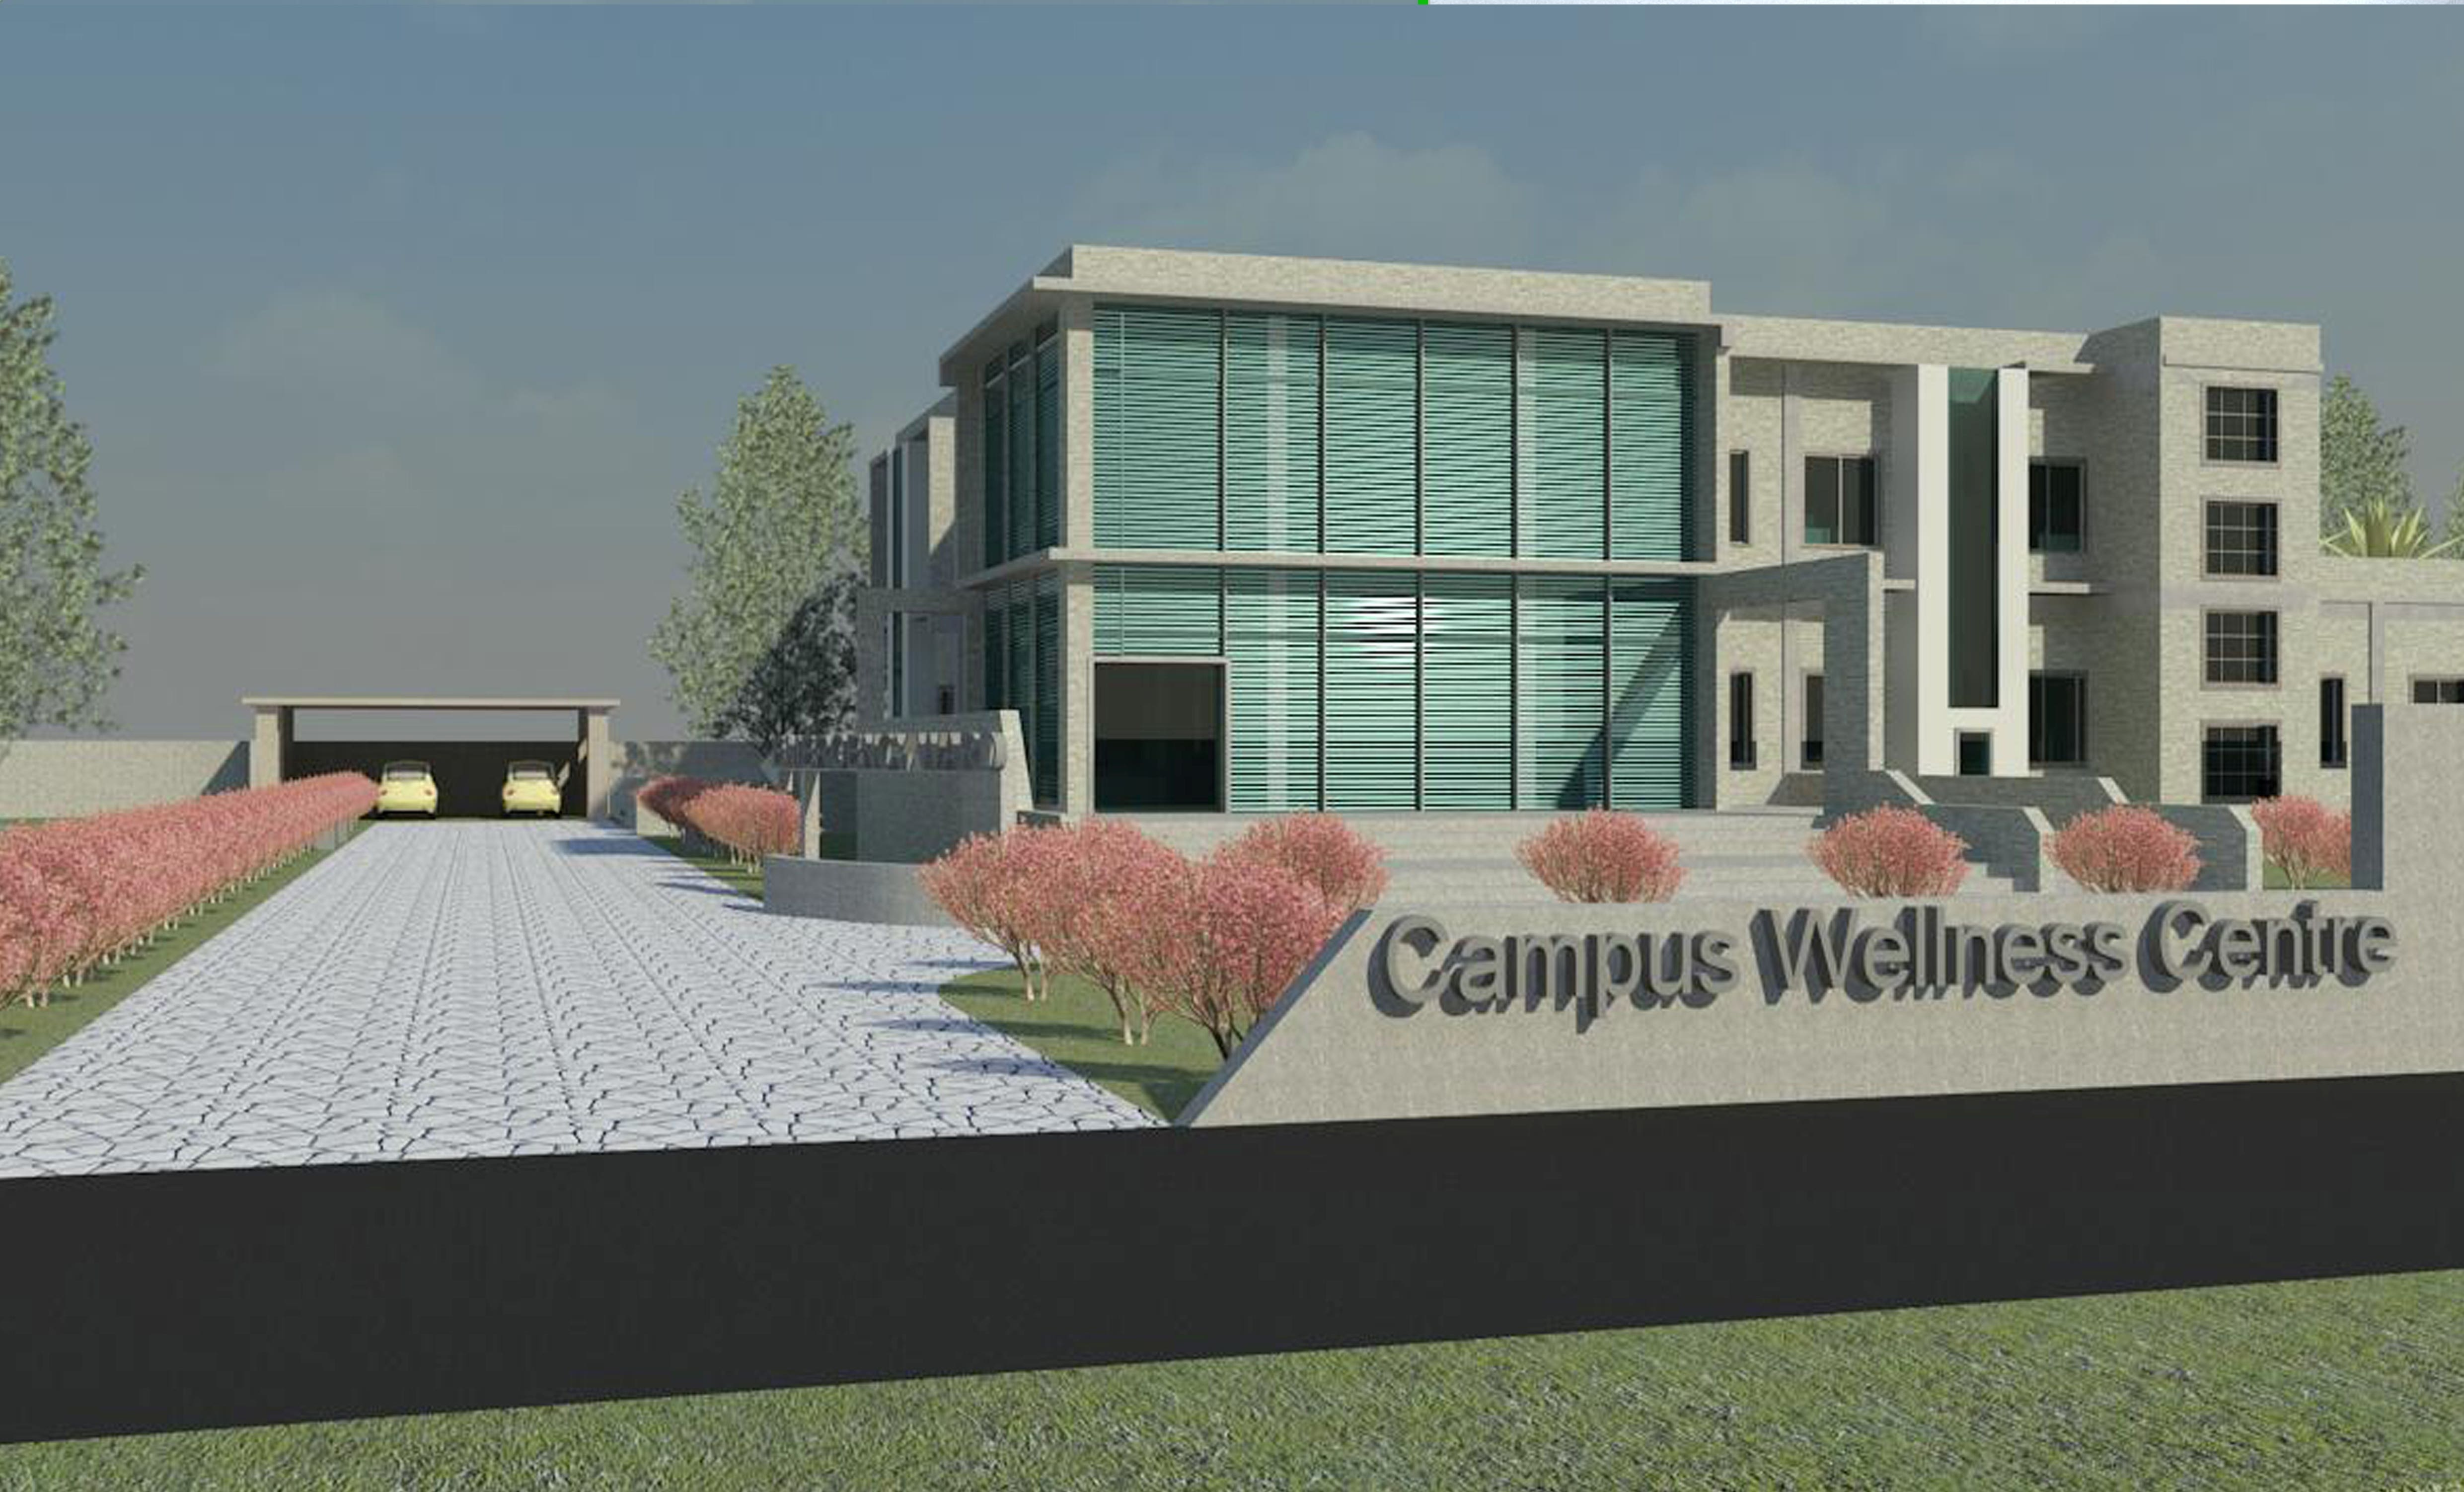 Campus wellness centre